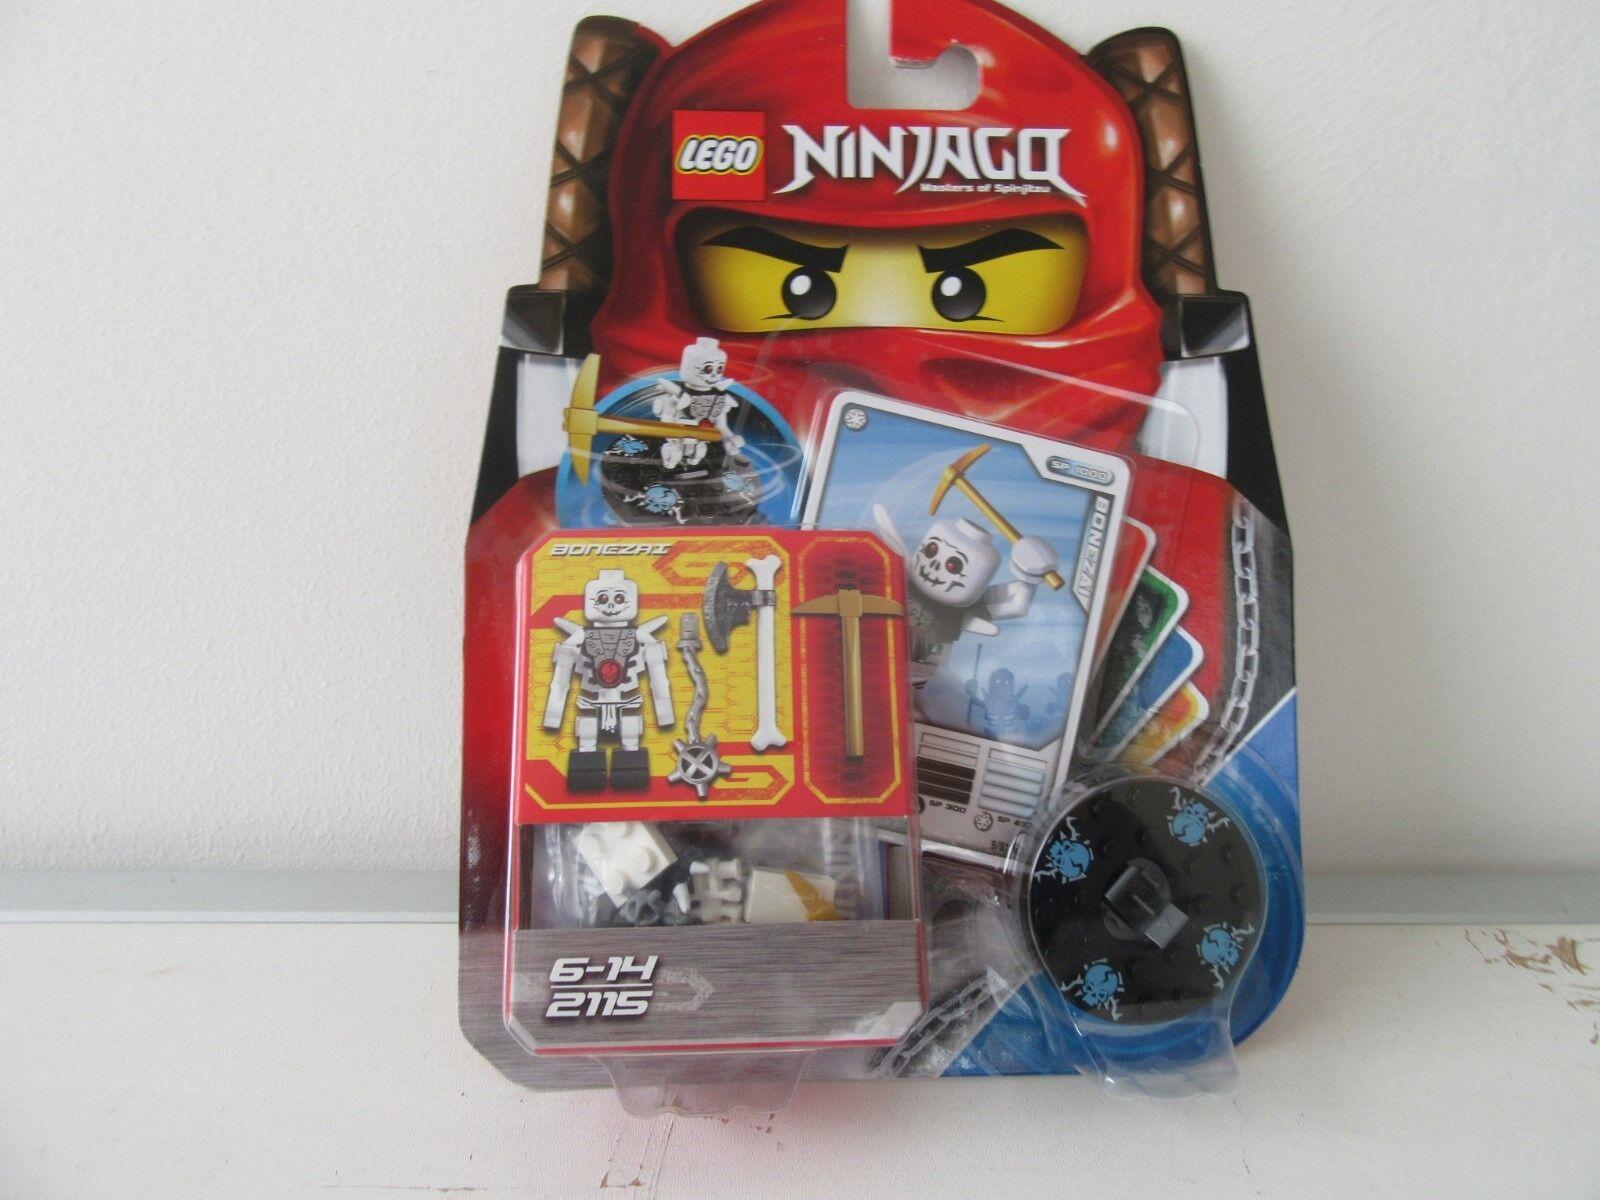 LEGO NINJAGO 2115  BONEZAI  Kämpfer /& Spinner /&  Karten 2115 Bonezai